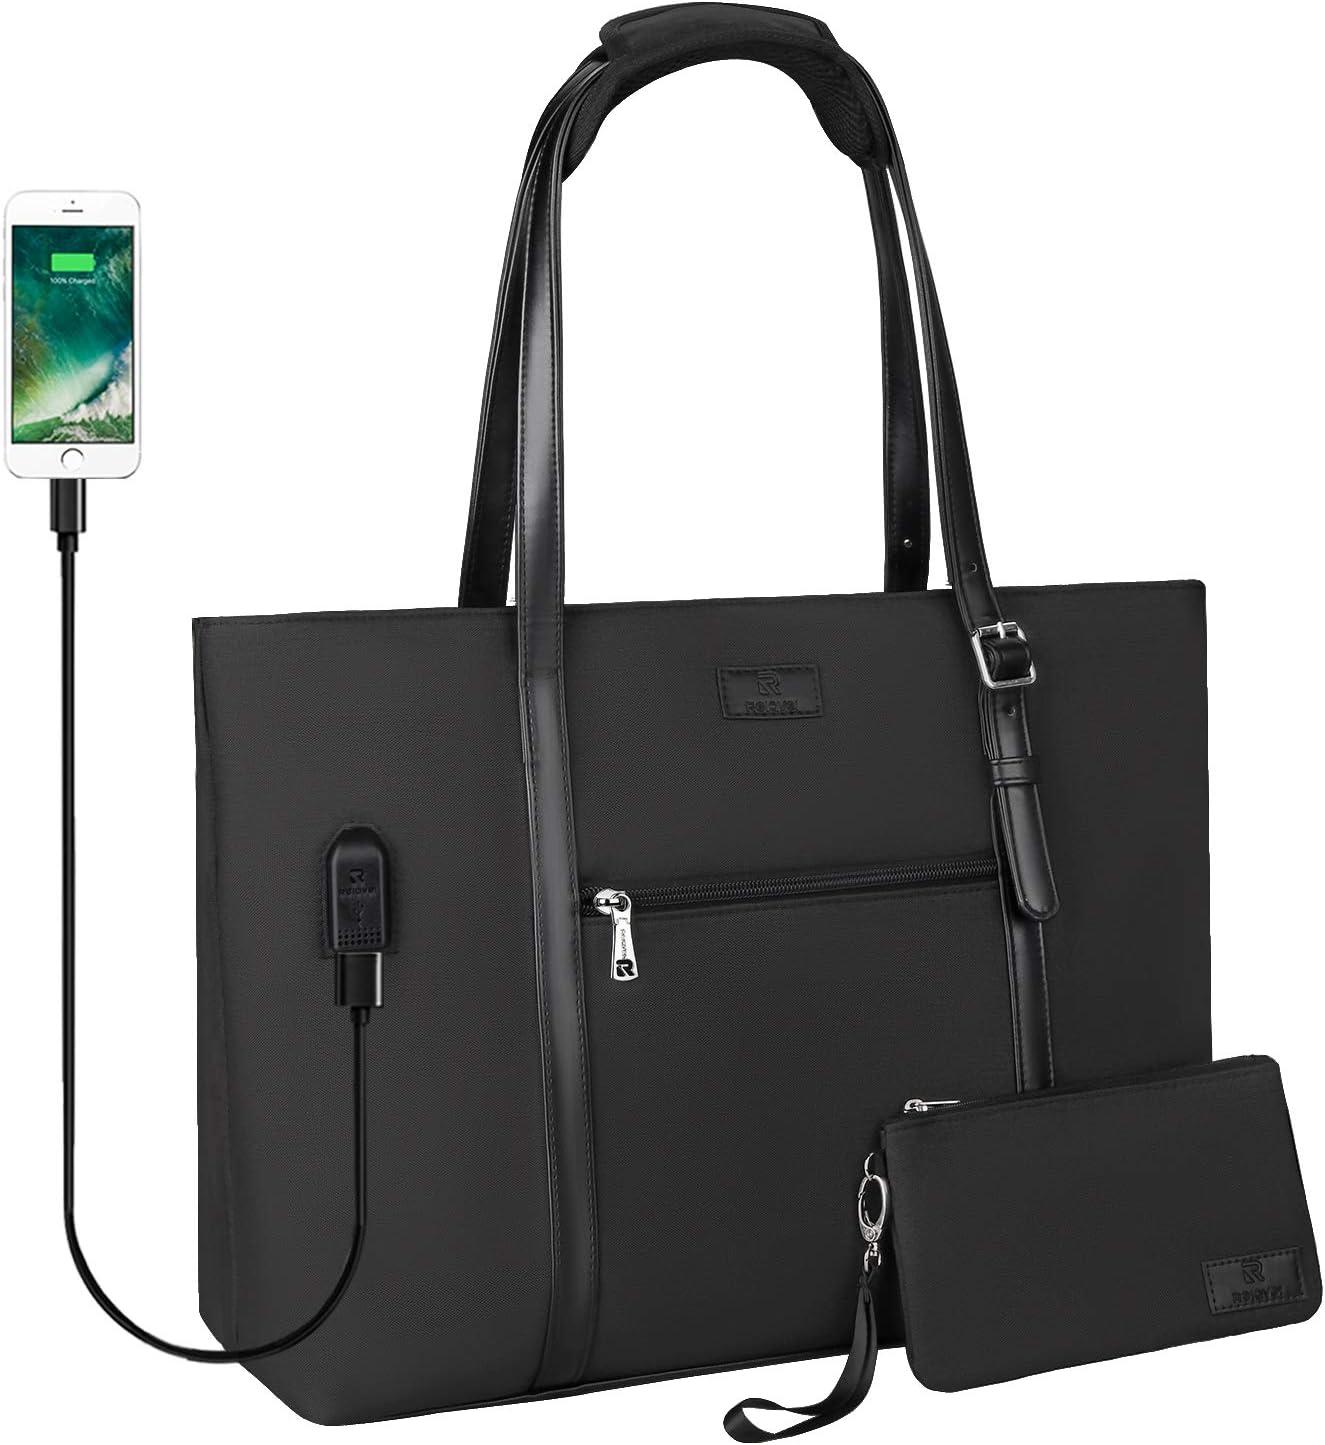 HDHUA Laptop Bag Professional Custom Business Backpack Waterproof USB Charging Minimalist Shoulder Bag 15.6 Inch Laptop Bag Oxford Cloth